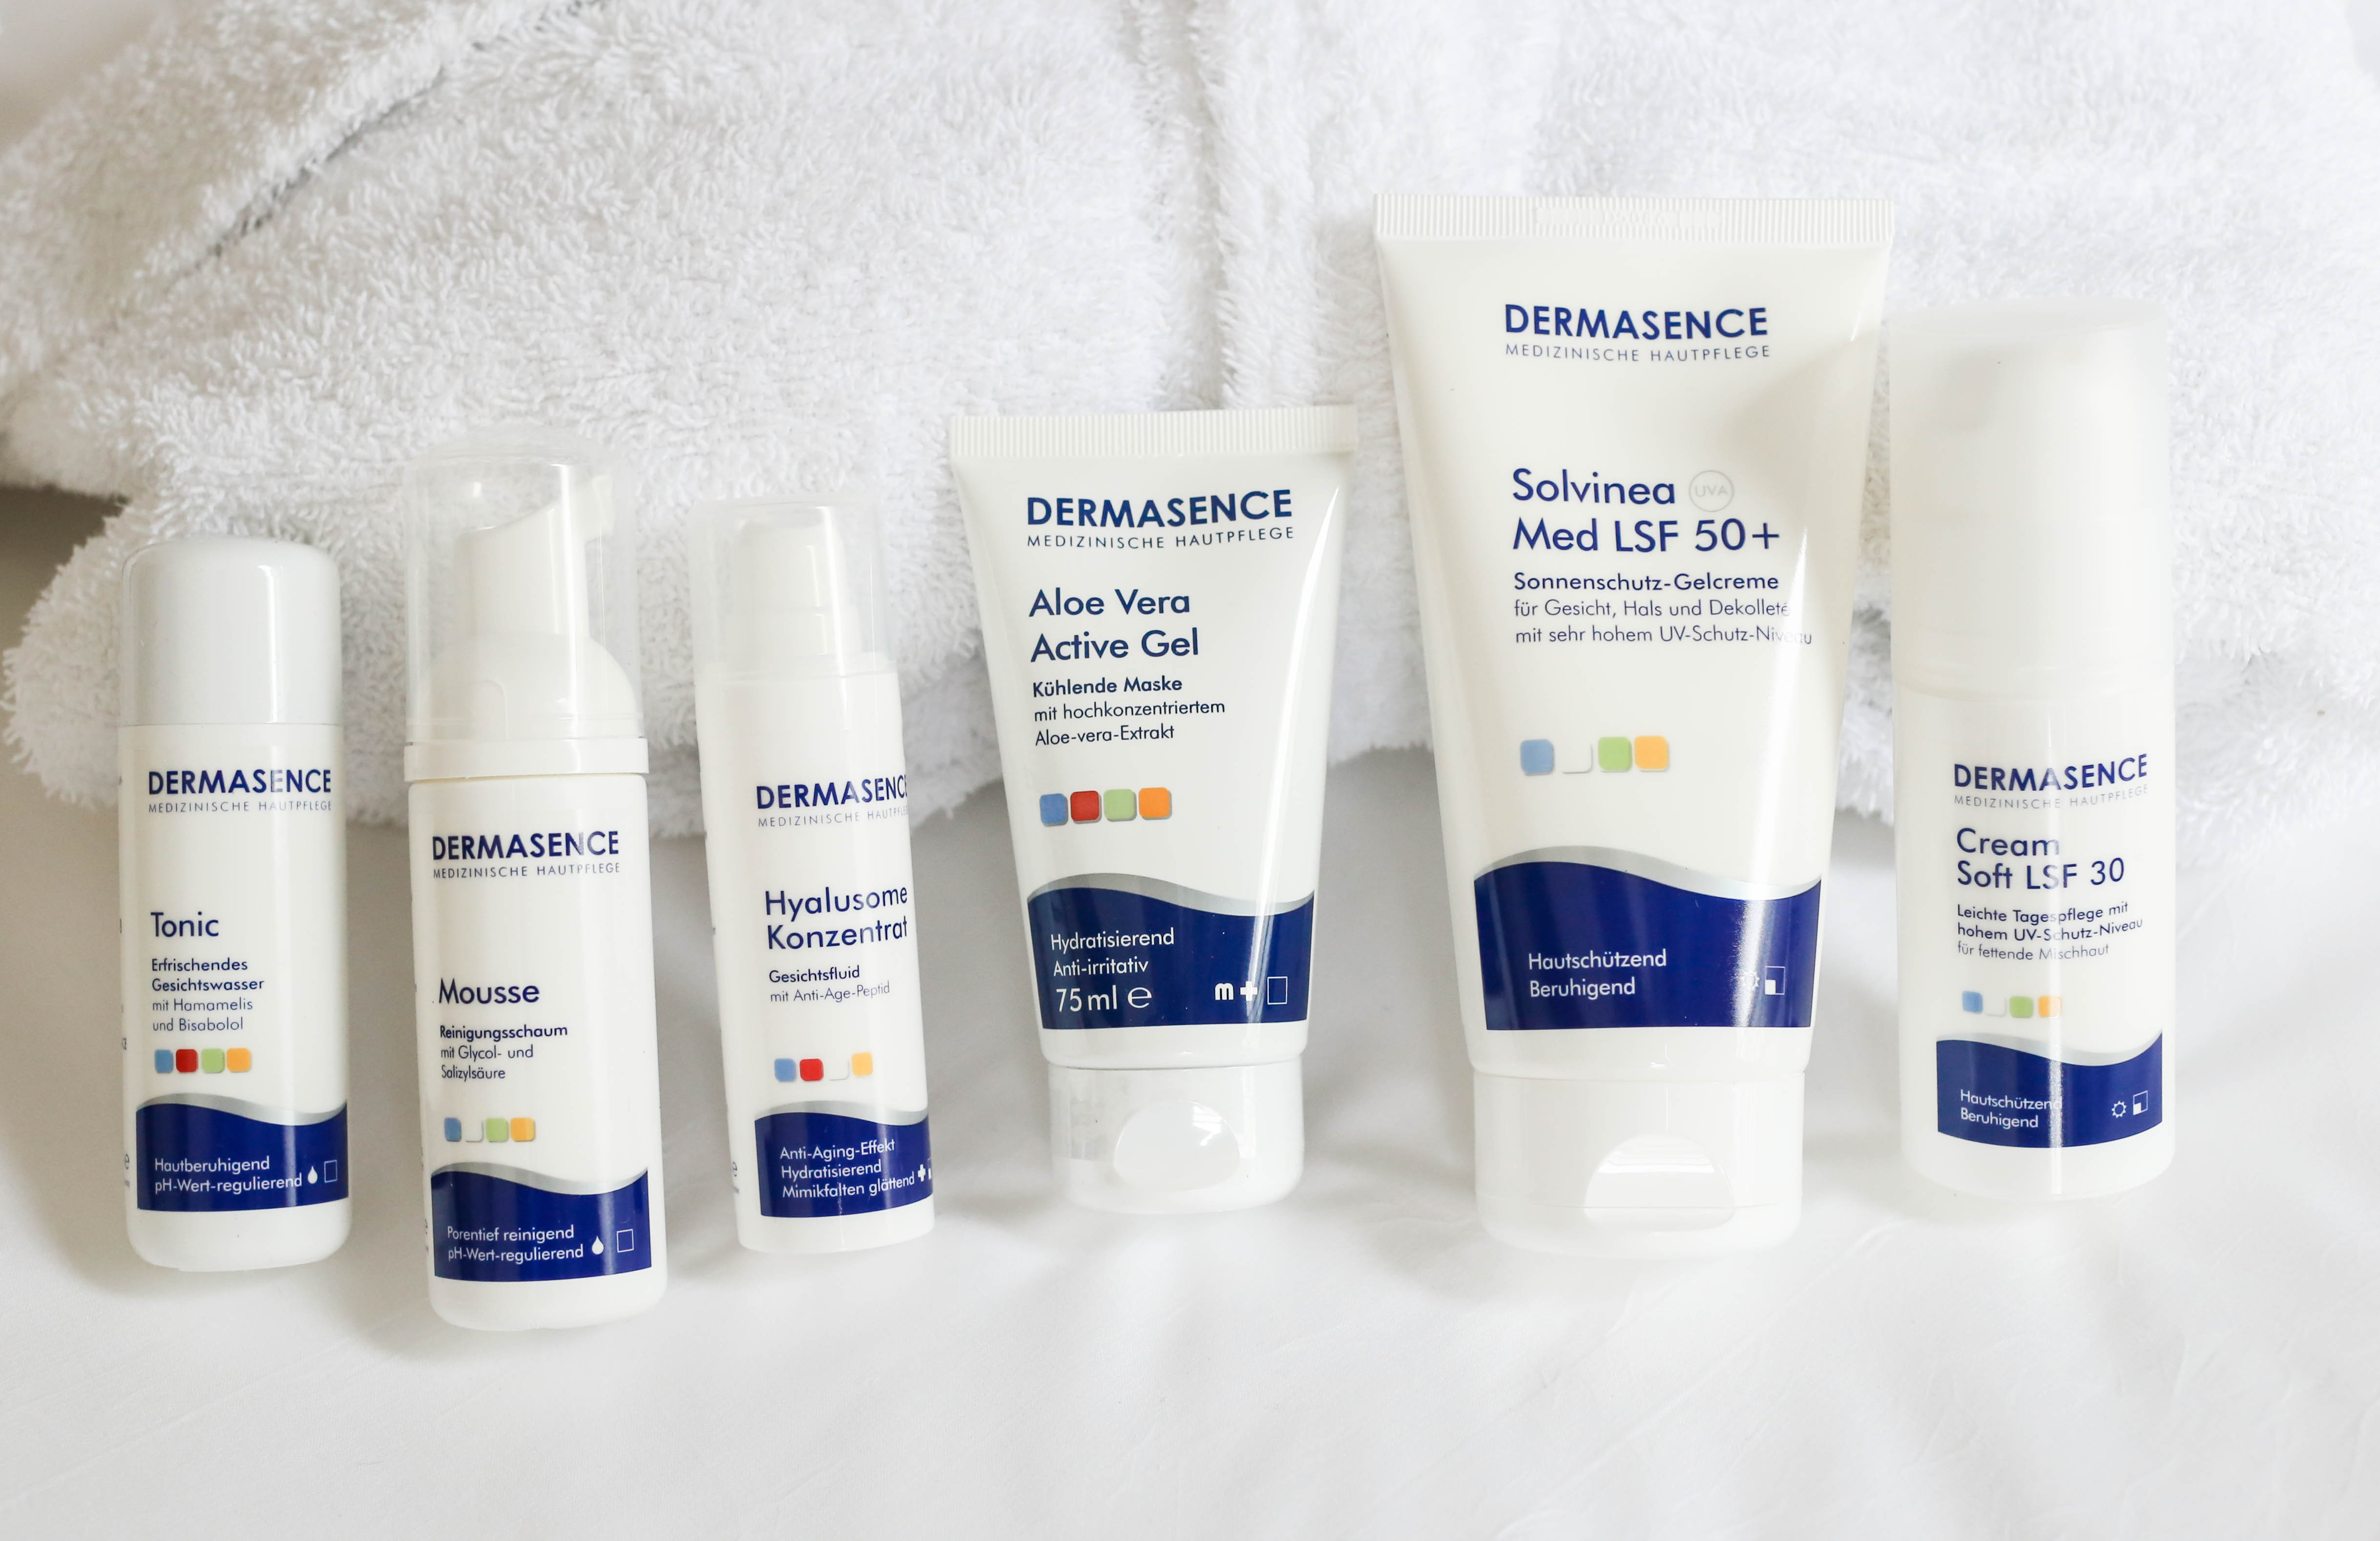 sommerhautpflege-urlaub-dermasence-beauty-kosmetik-hautpflege-beautyblogger_0744